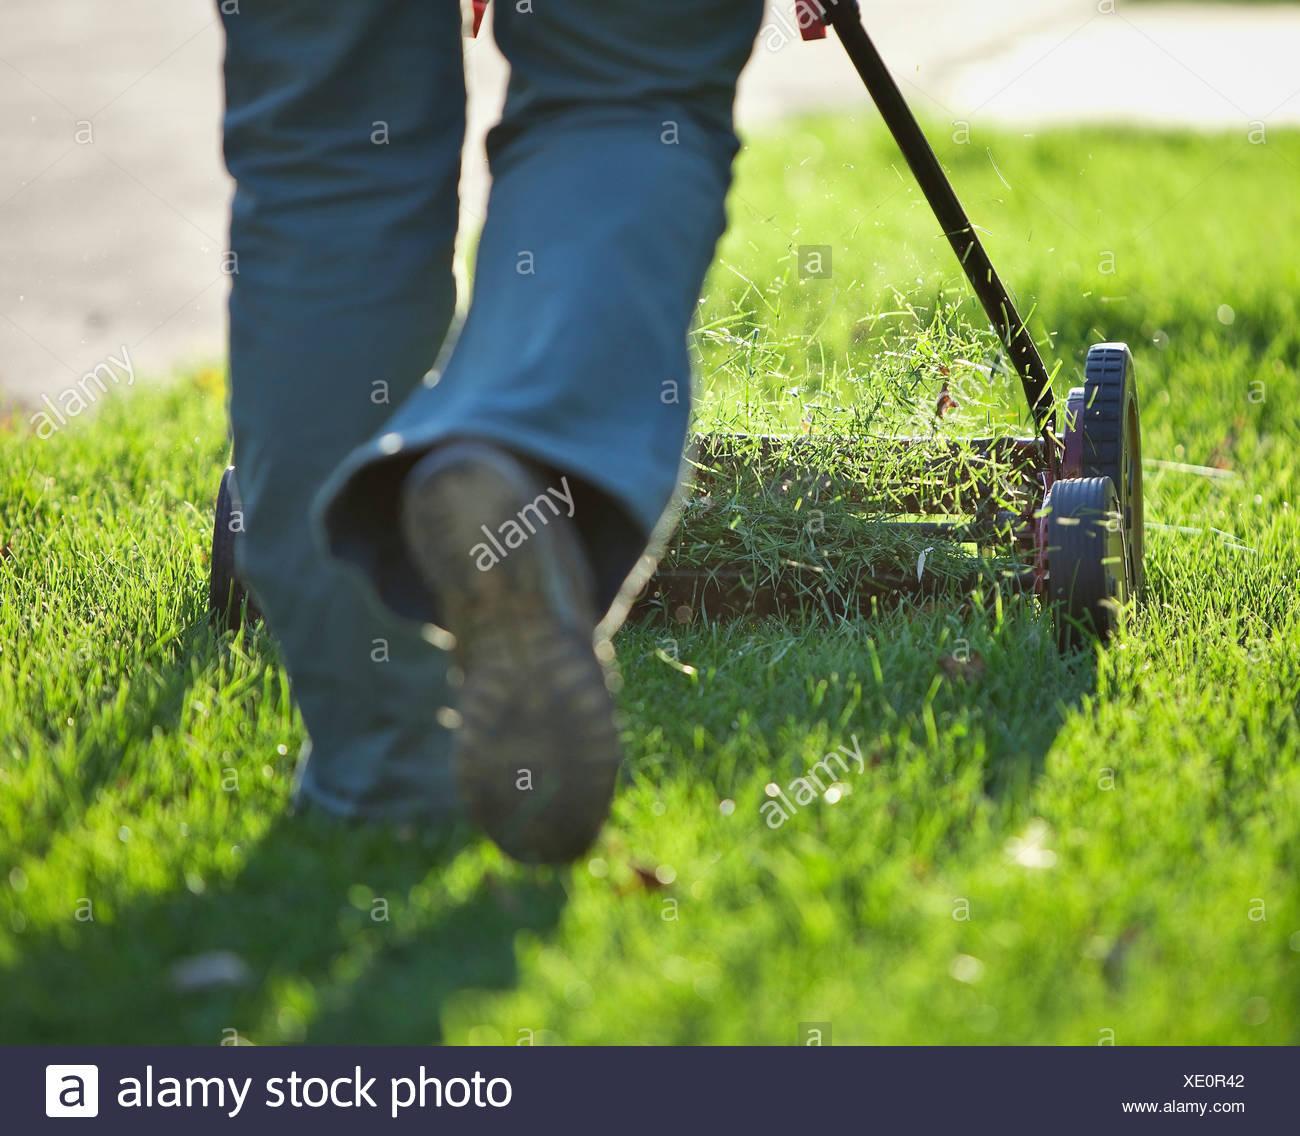 Woman cutting grass with environmentally friendly lawn mower. Winnipeg, Manitoba, Canada. - Stock Image